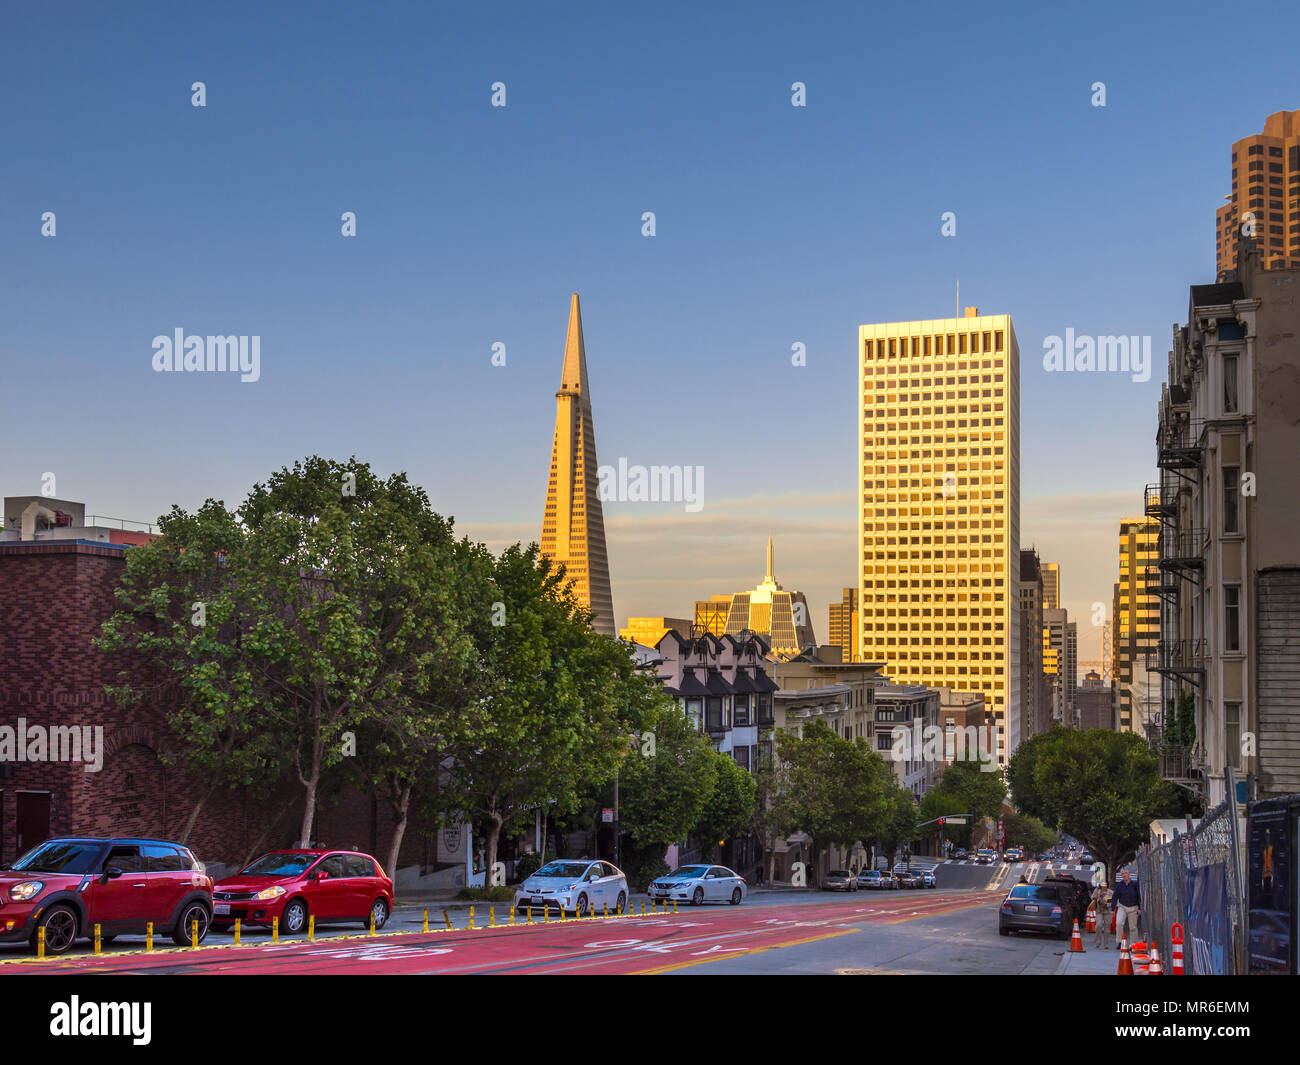 Sunset on the Transamerica Building skyscraper, San Francisco, CA, USA. - Stock Image